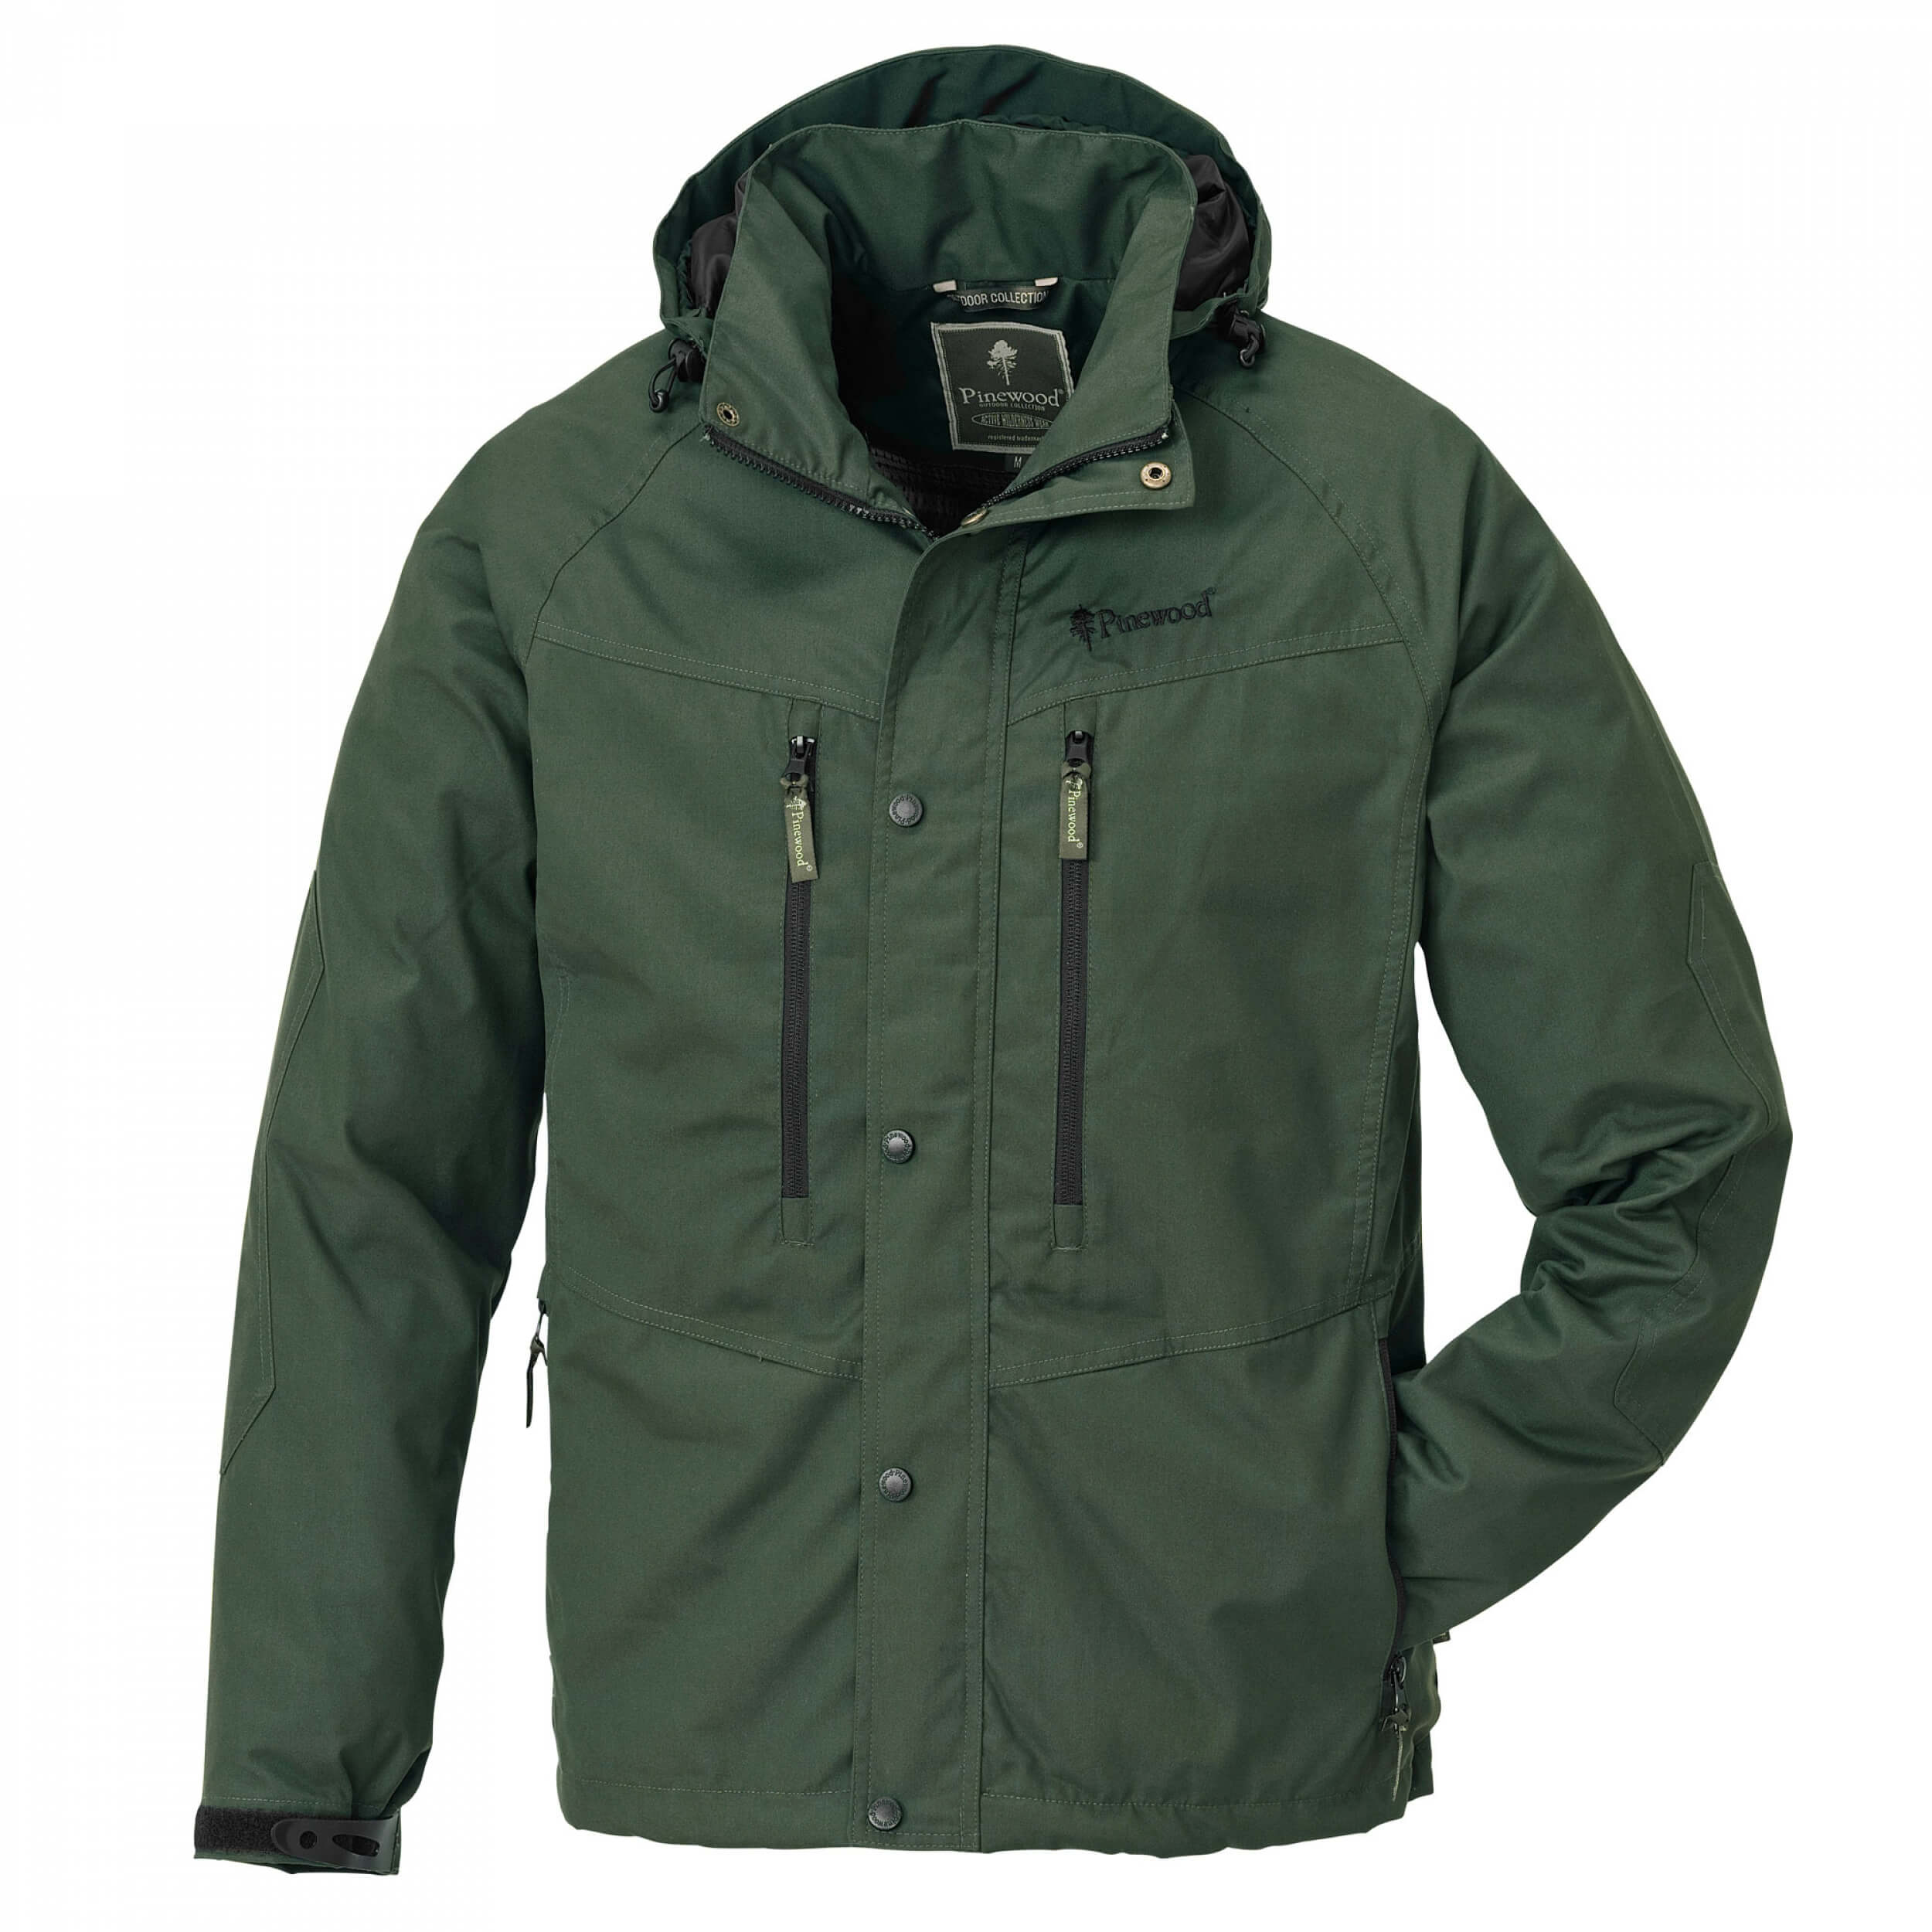 Pinewood Corsica Extreme Jacke dunkelgrün